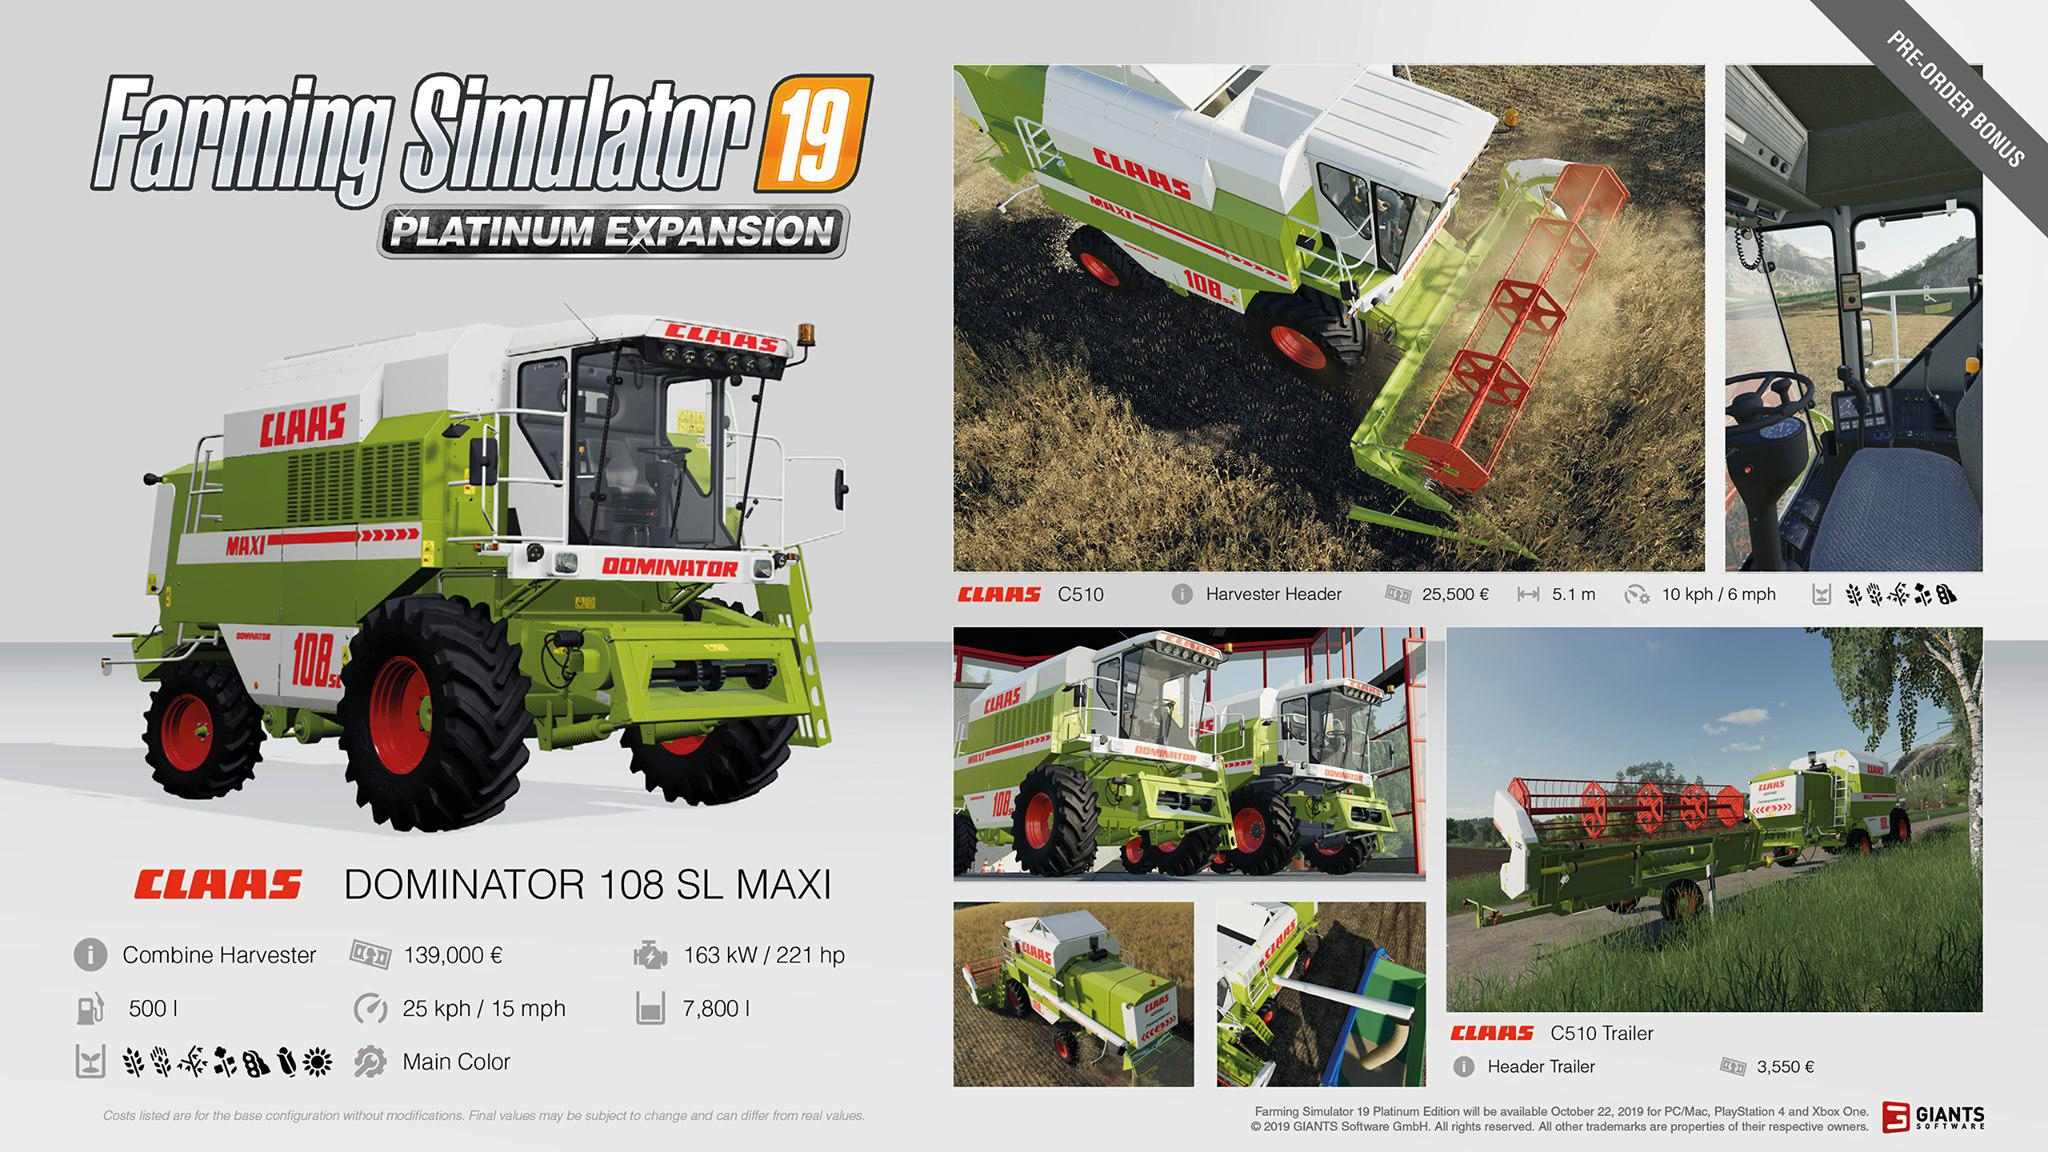 FS19 Farming Simulator 19 Platinum fact sheet #1 - Farming